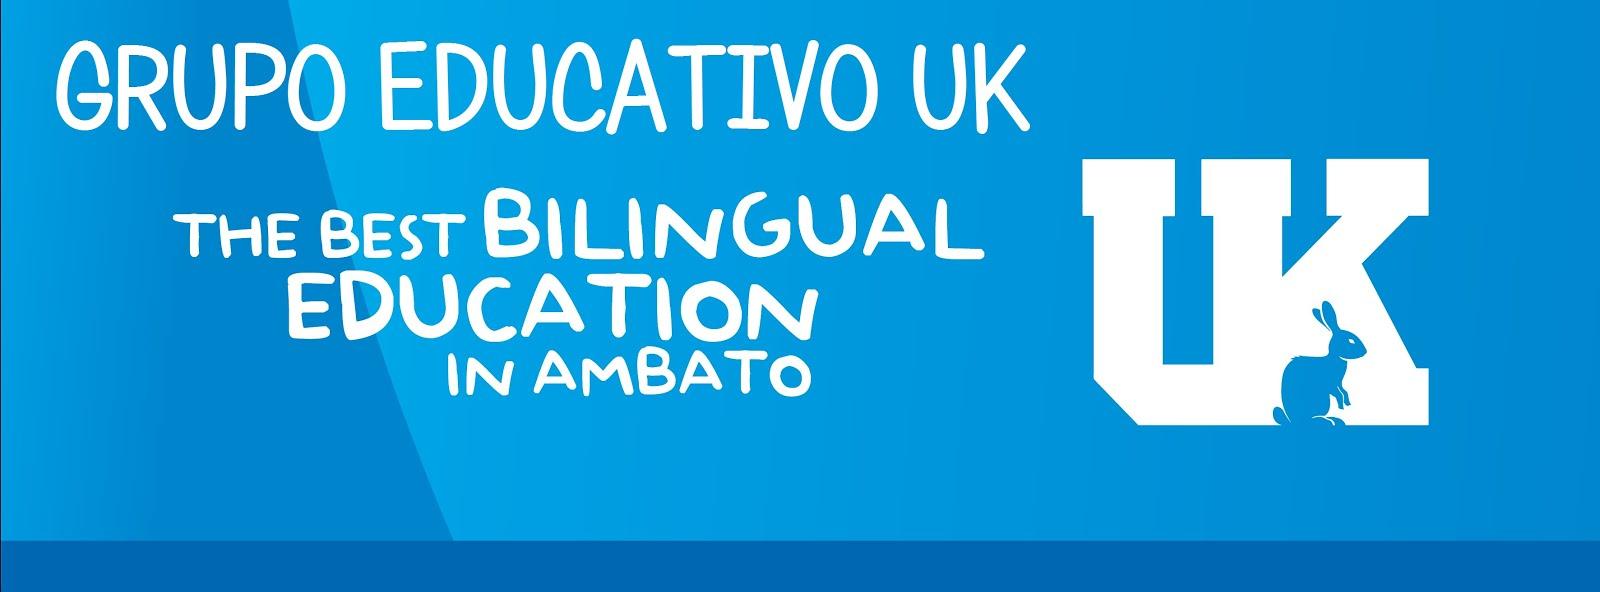 Grupo Educativo UK